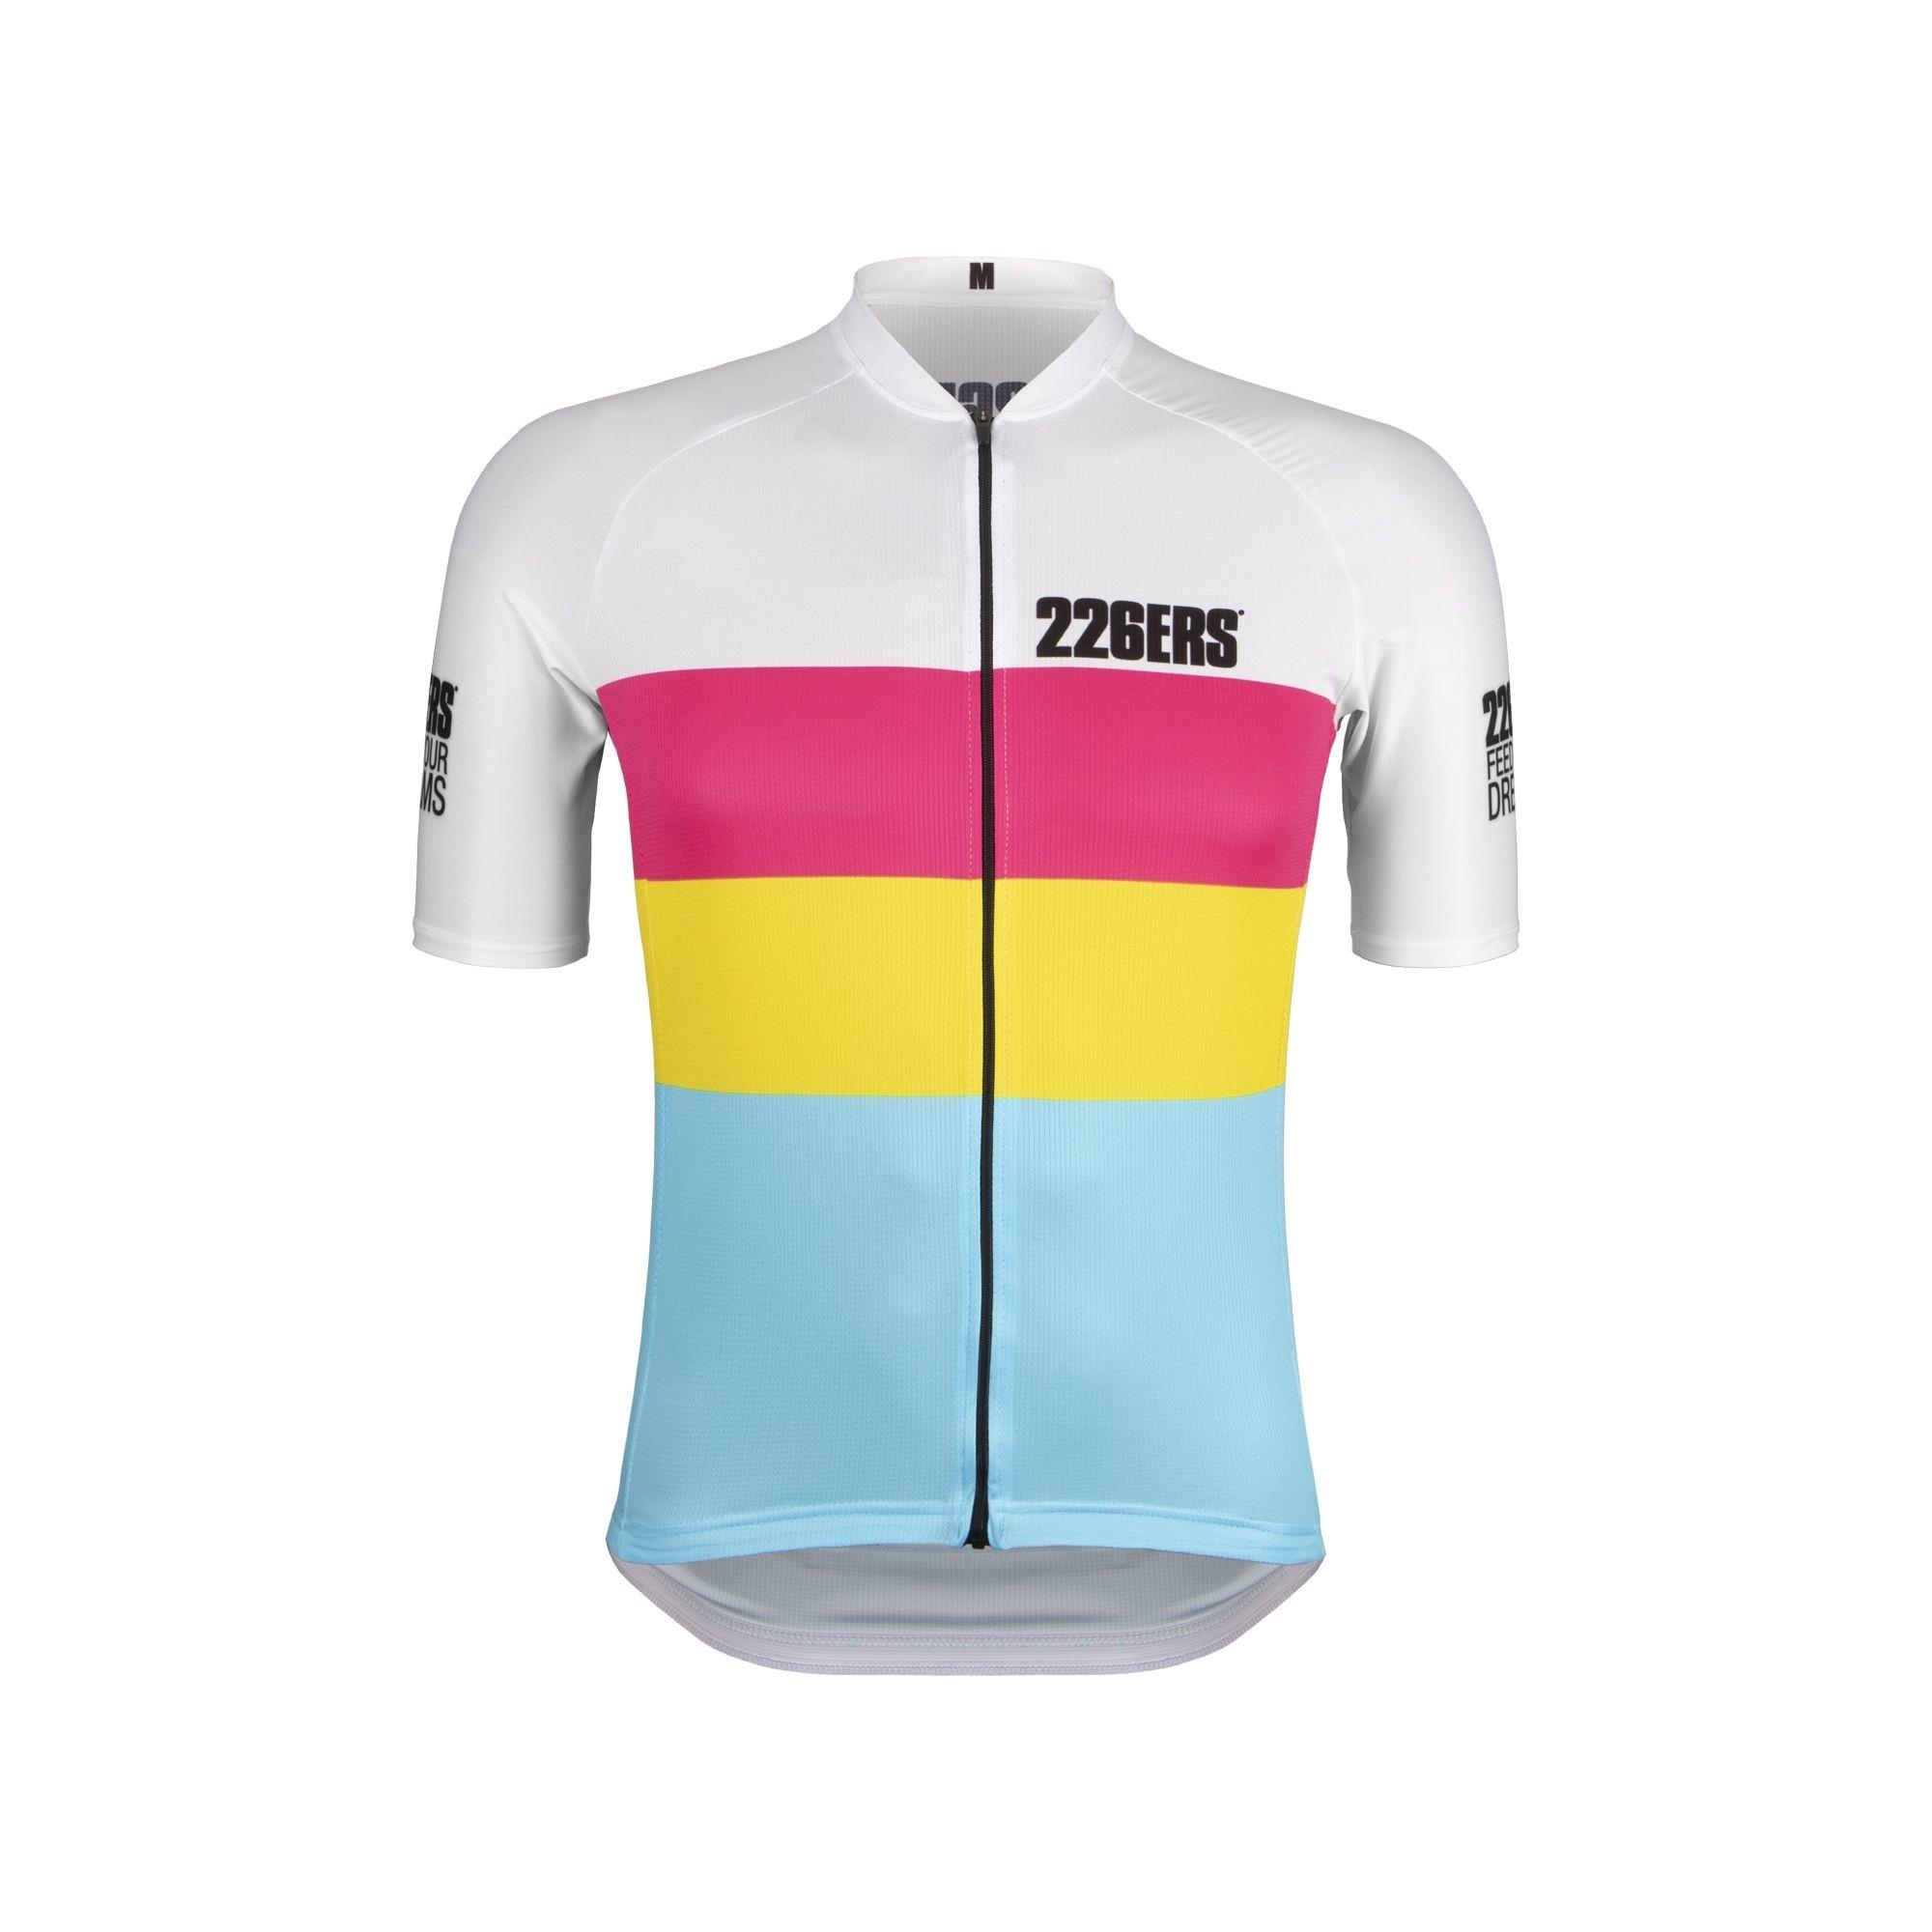 226ERS | Cycling Jersey | Hydrazero-1